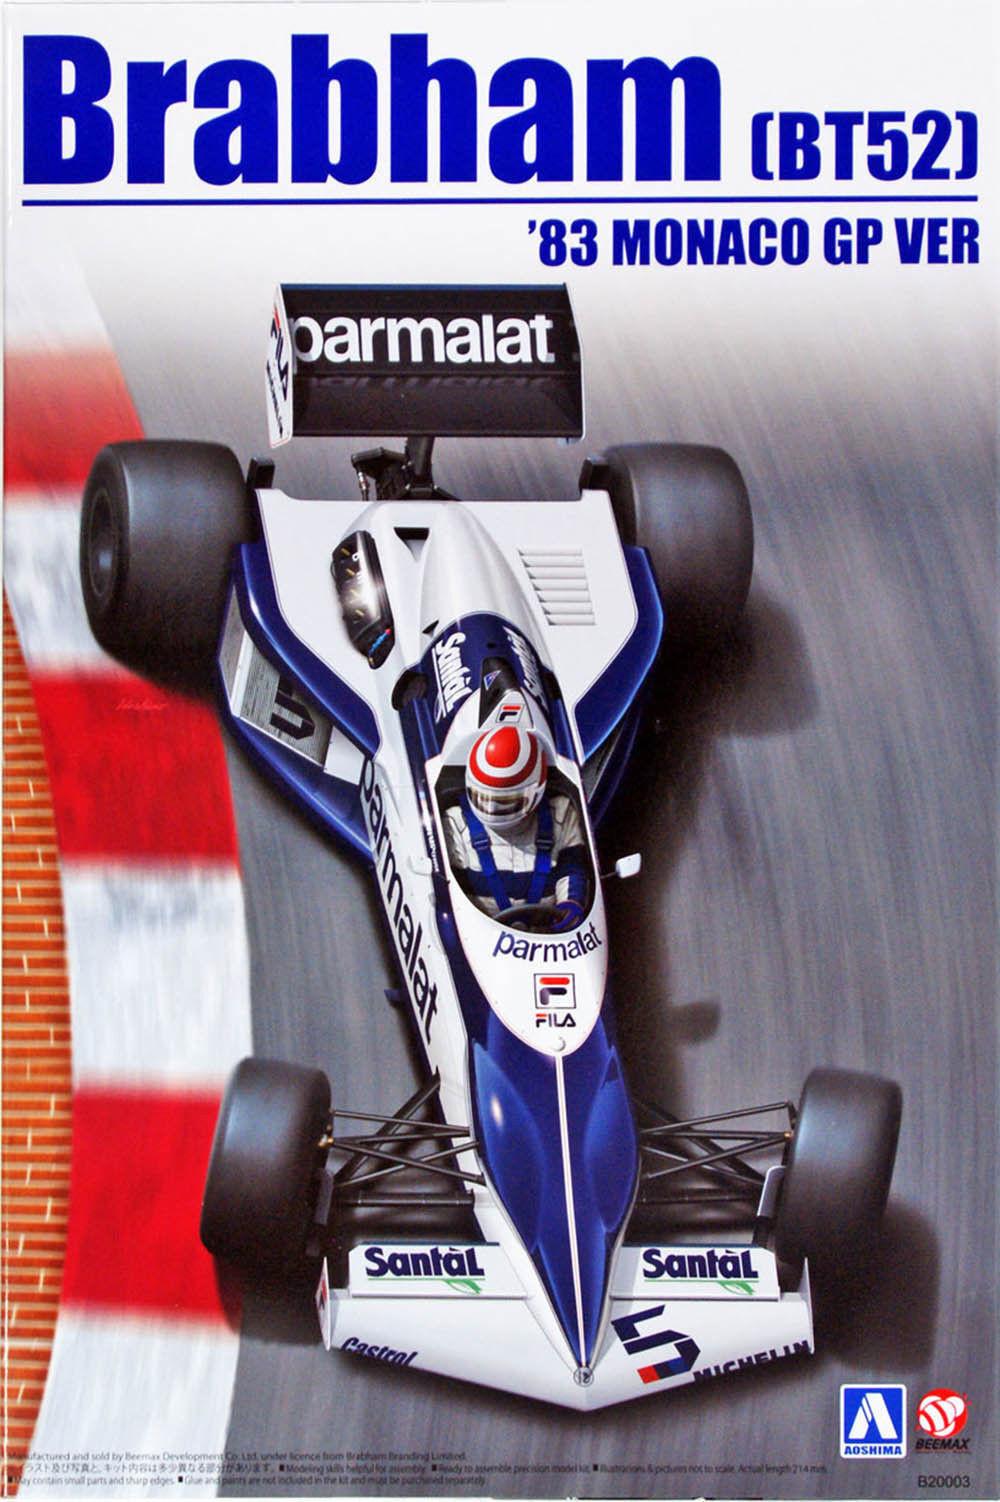 KIT KIT KIT AOSHIMA - BEEMAX  1 20 AUTO F1 BRABHAM BT52 '83 MONACO GP VER B20003 NO.14 76c7b9